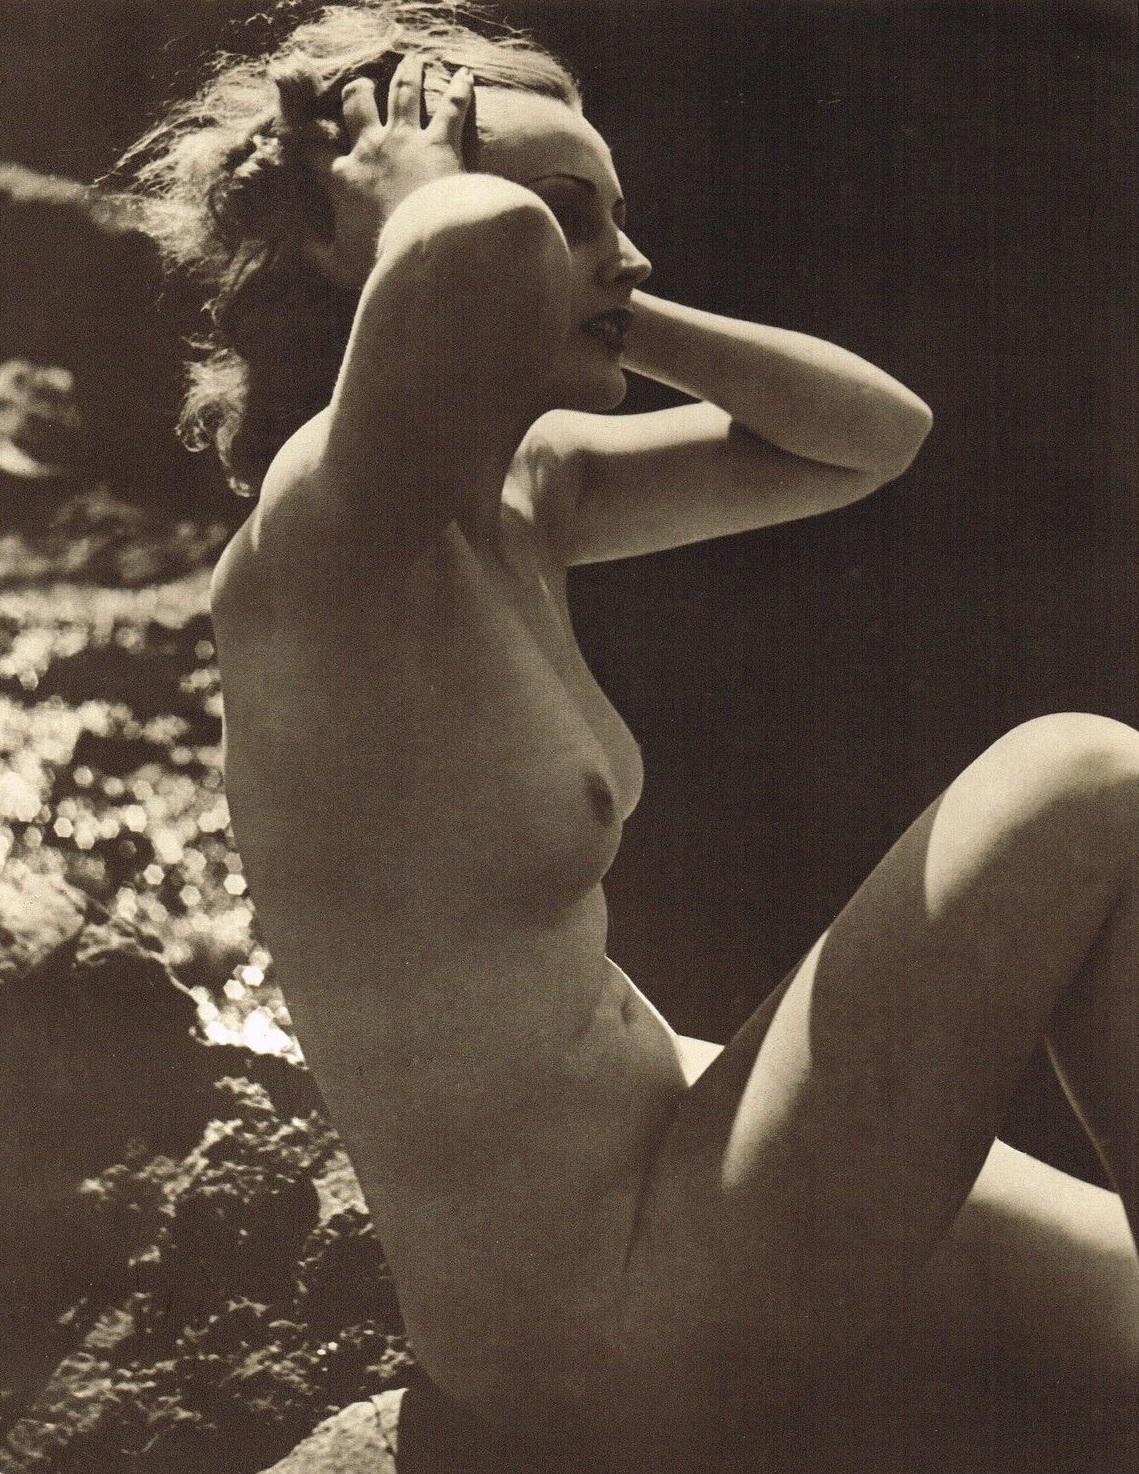 John Everard -Study of Nude (Nude Lady Water Rocks) photogravure 1940